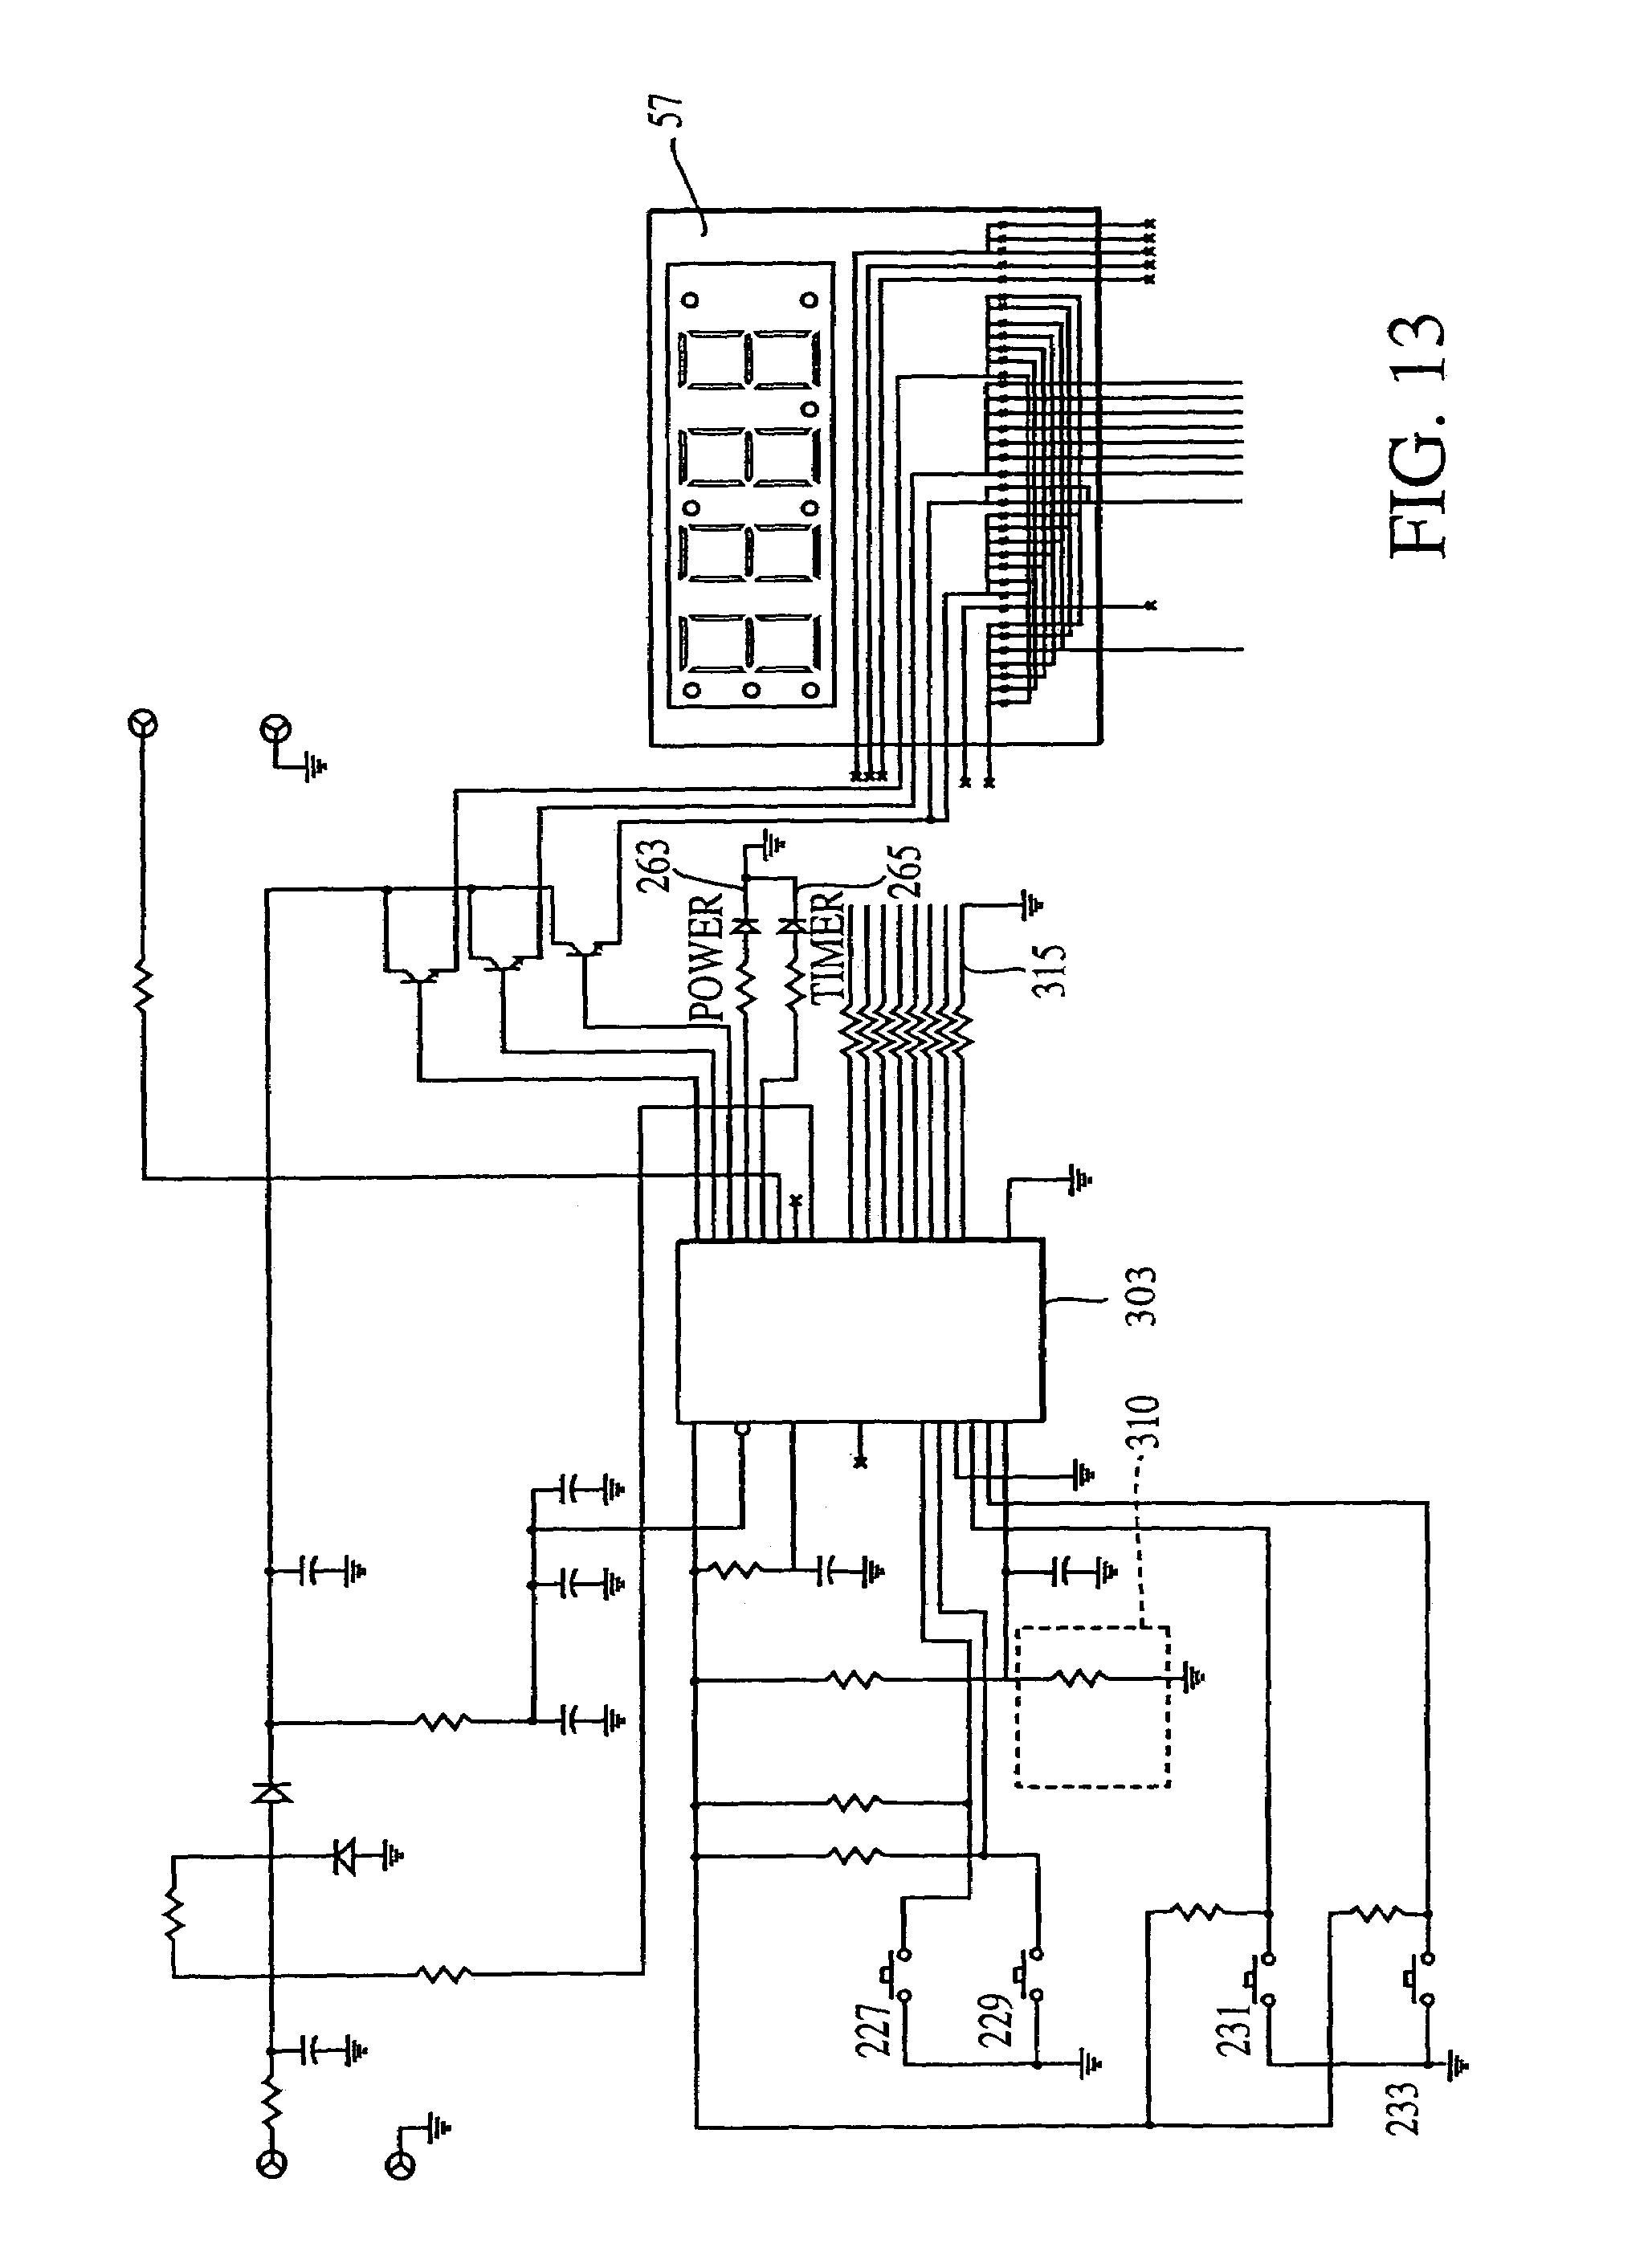 1991 saab 9000 wiring diagram 2000 jeep wrangler fuse box layout, Wiring diagram